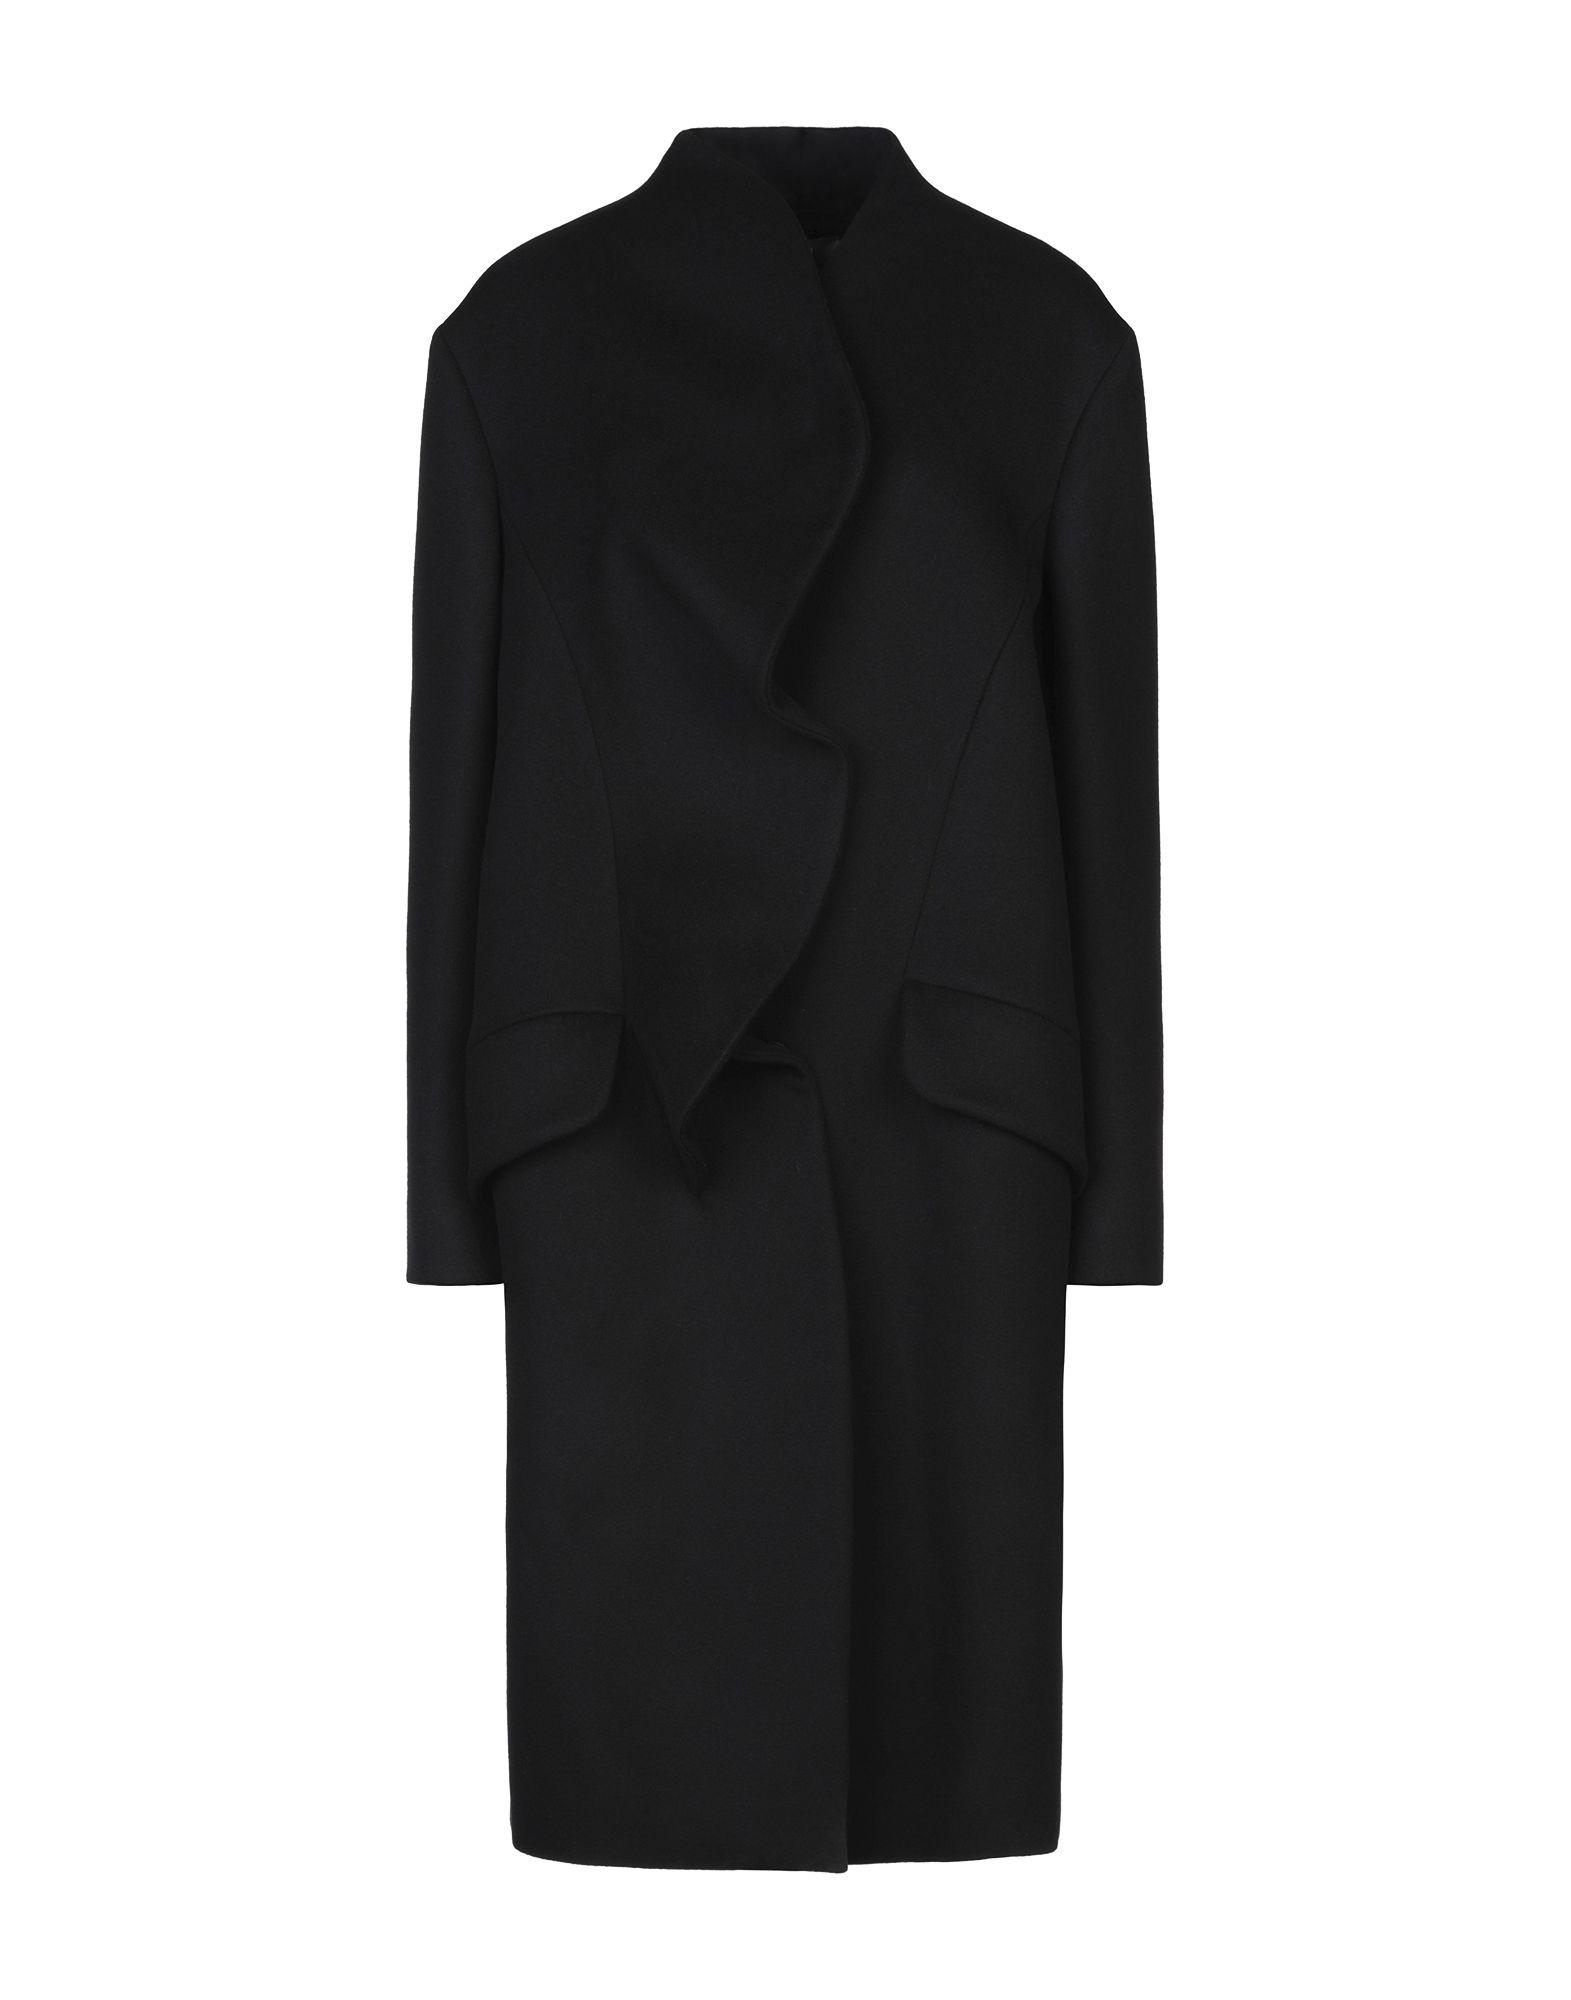 ROBERTA FURLANETTO Пальто roberta furlanetto пиджак